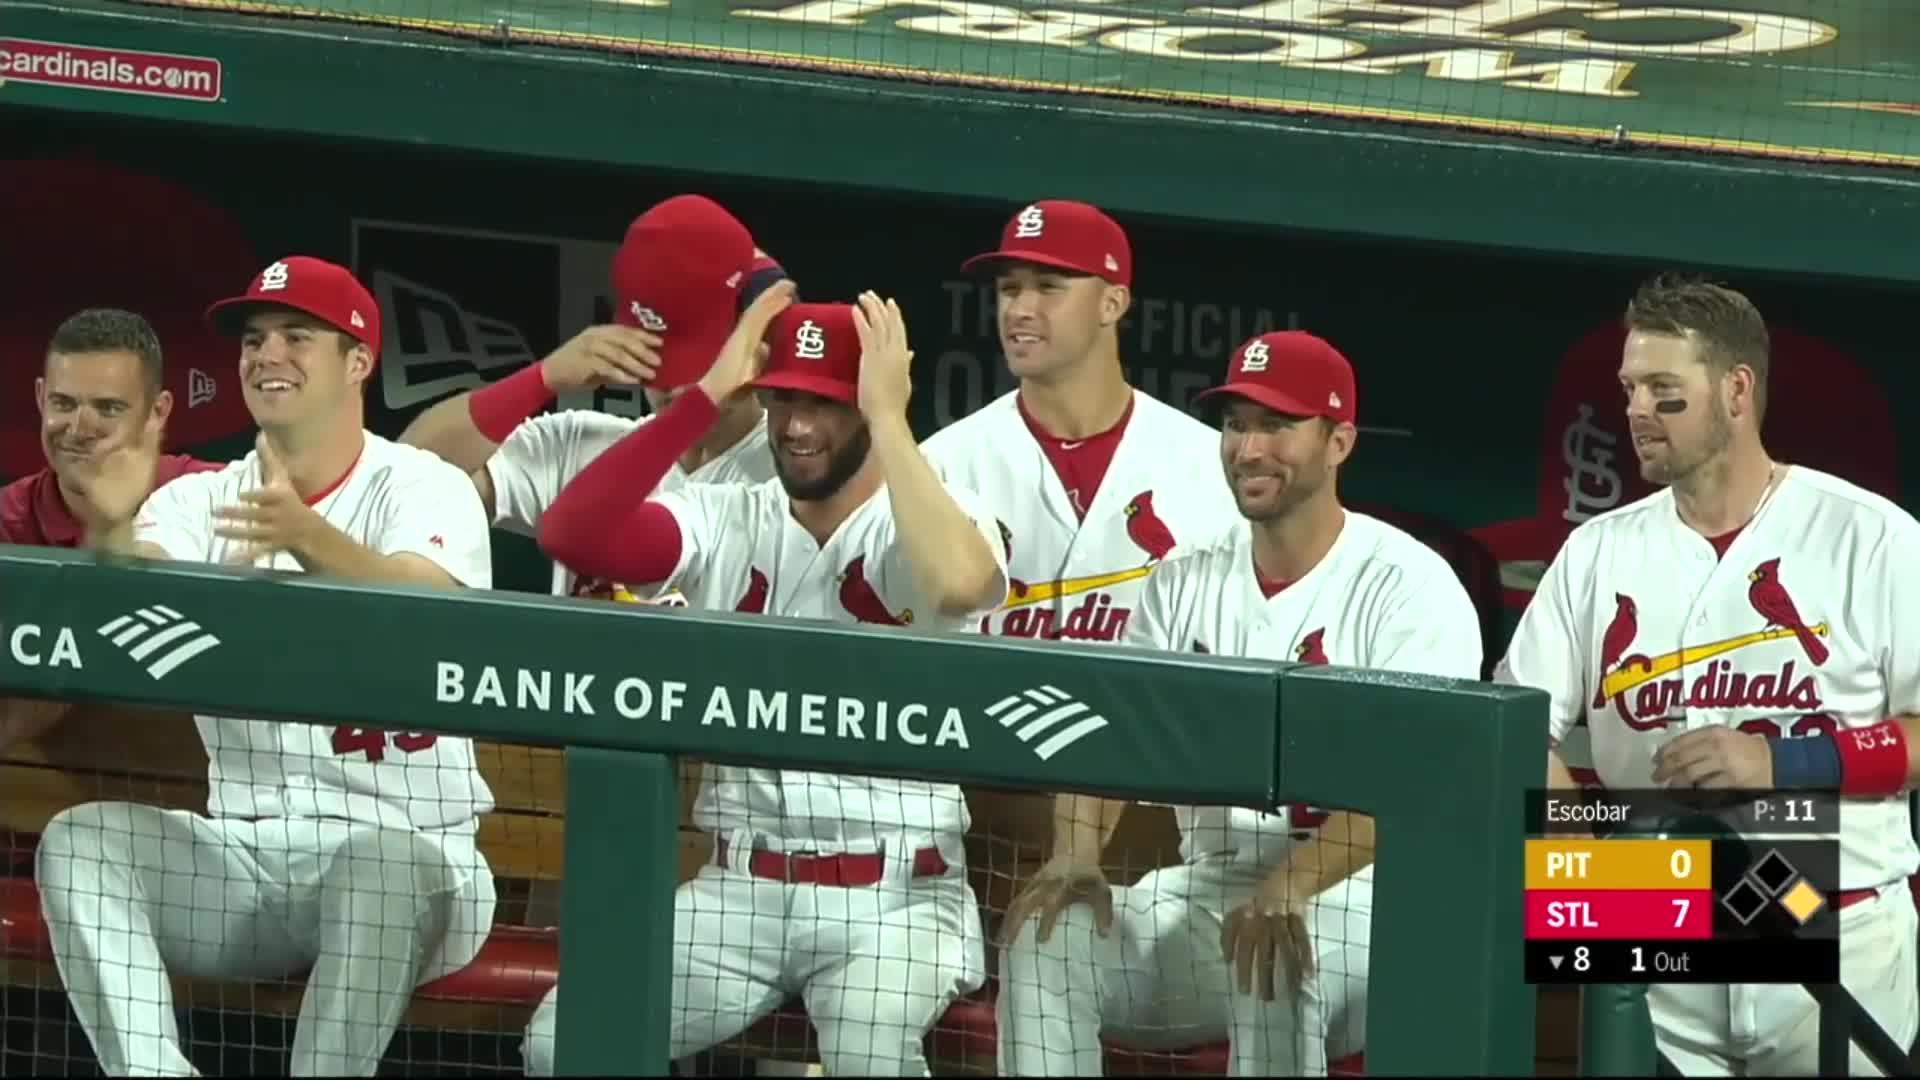 baseball, cardinals, pittsburgh pirates, st louis cardinals, st. louis, Cardinals bench celebrates Mikolas' hit. GIFs